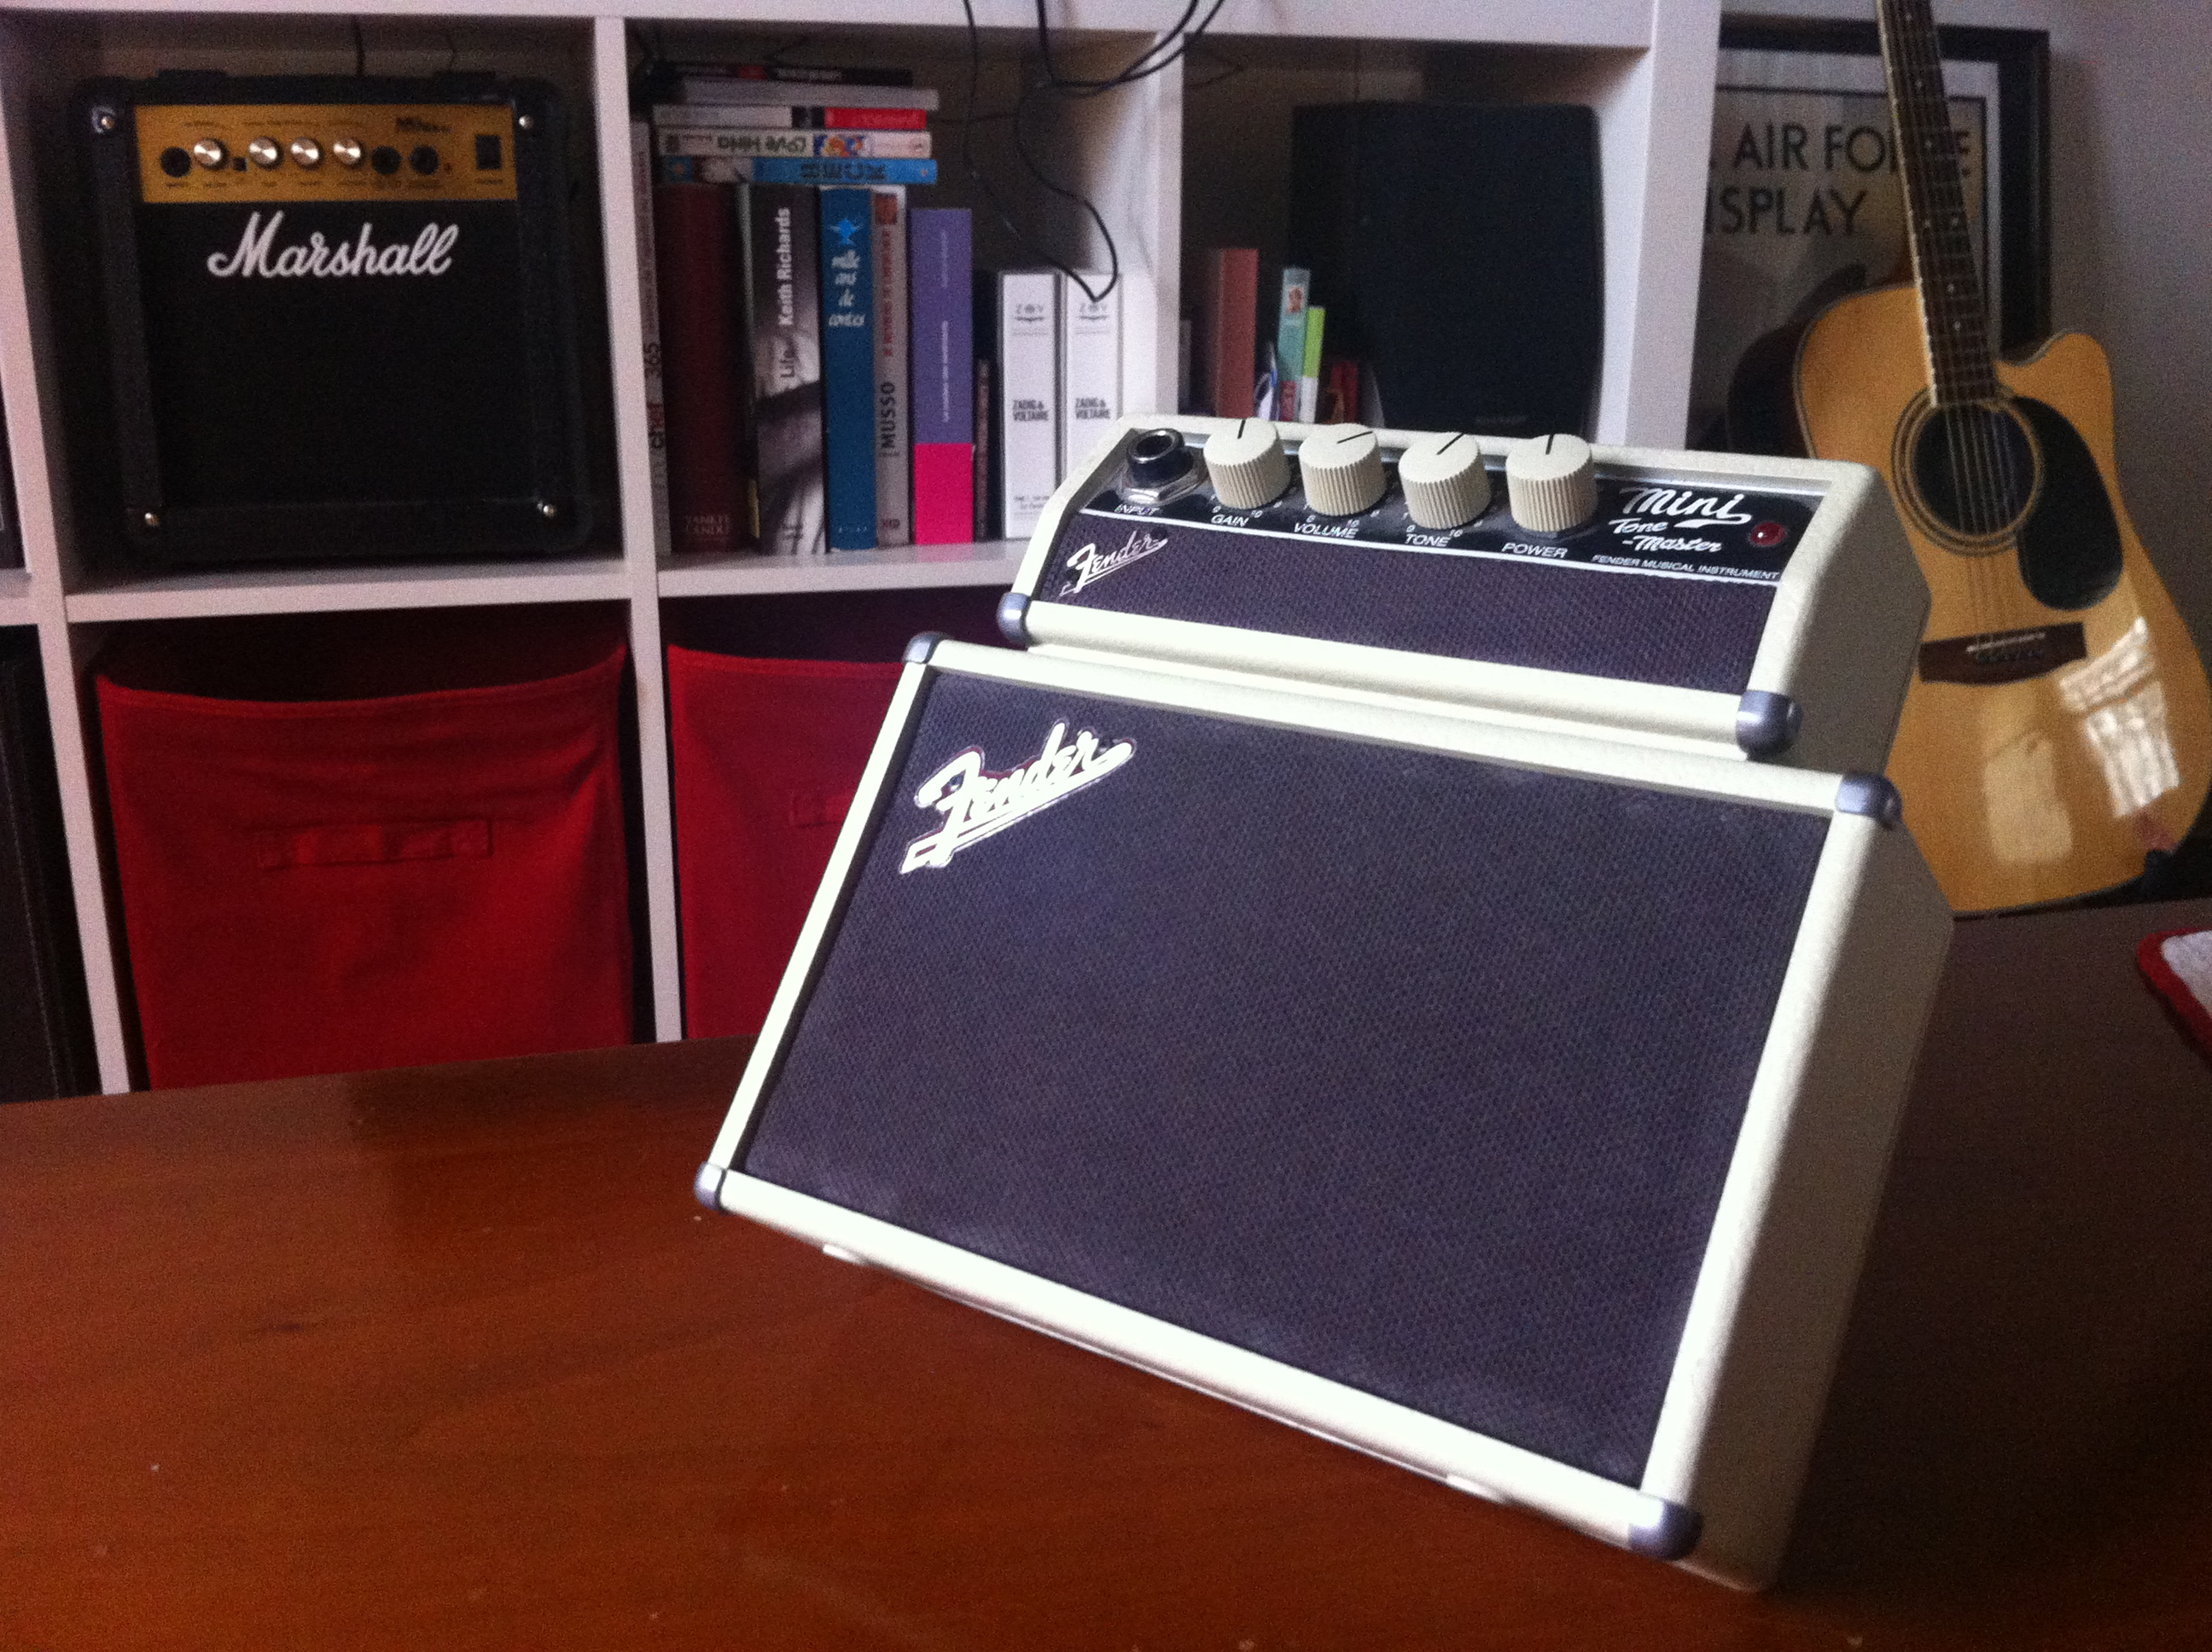 Fender mini tonemaster expii image 423436 audiofanzine fender mini tonemaster expii ryuhazan images voltagebd Images